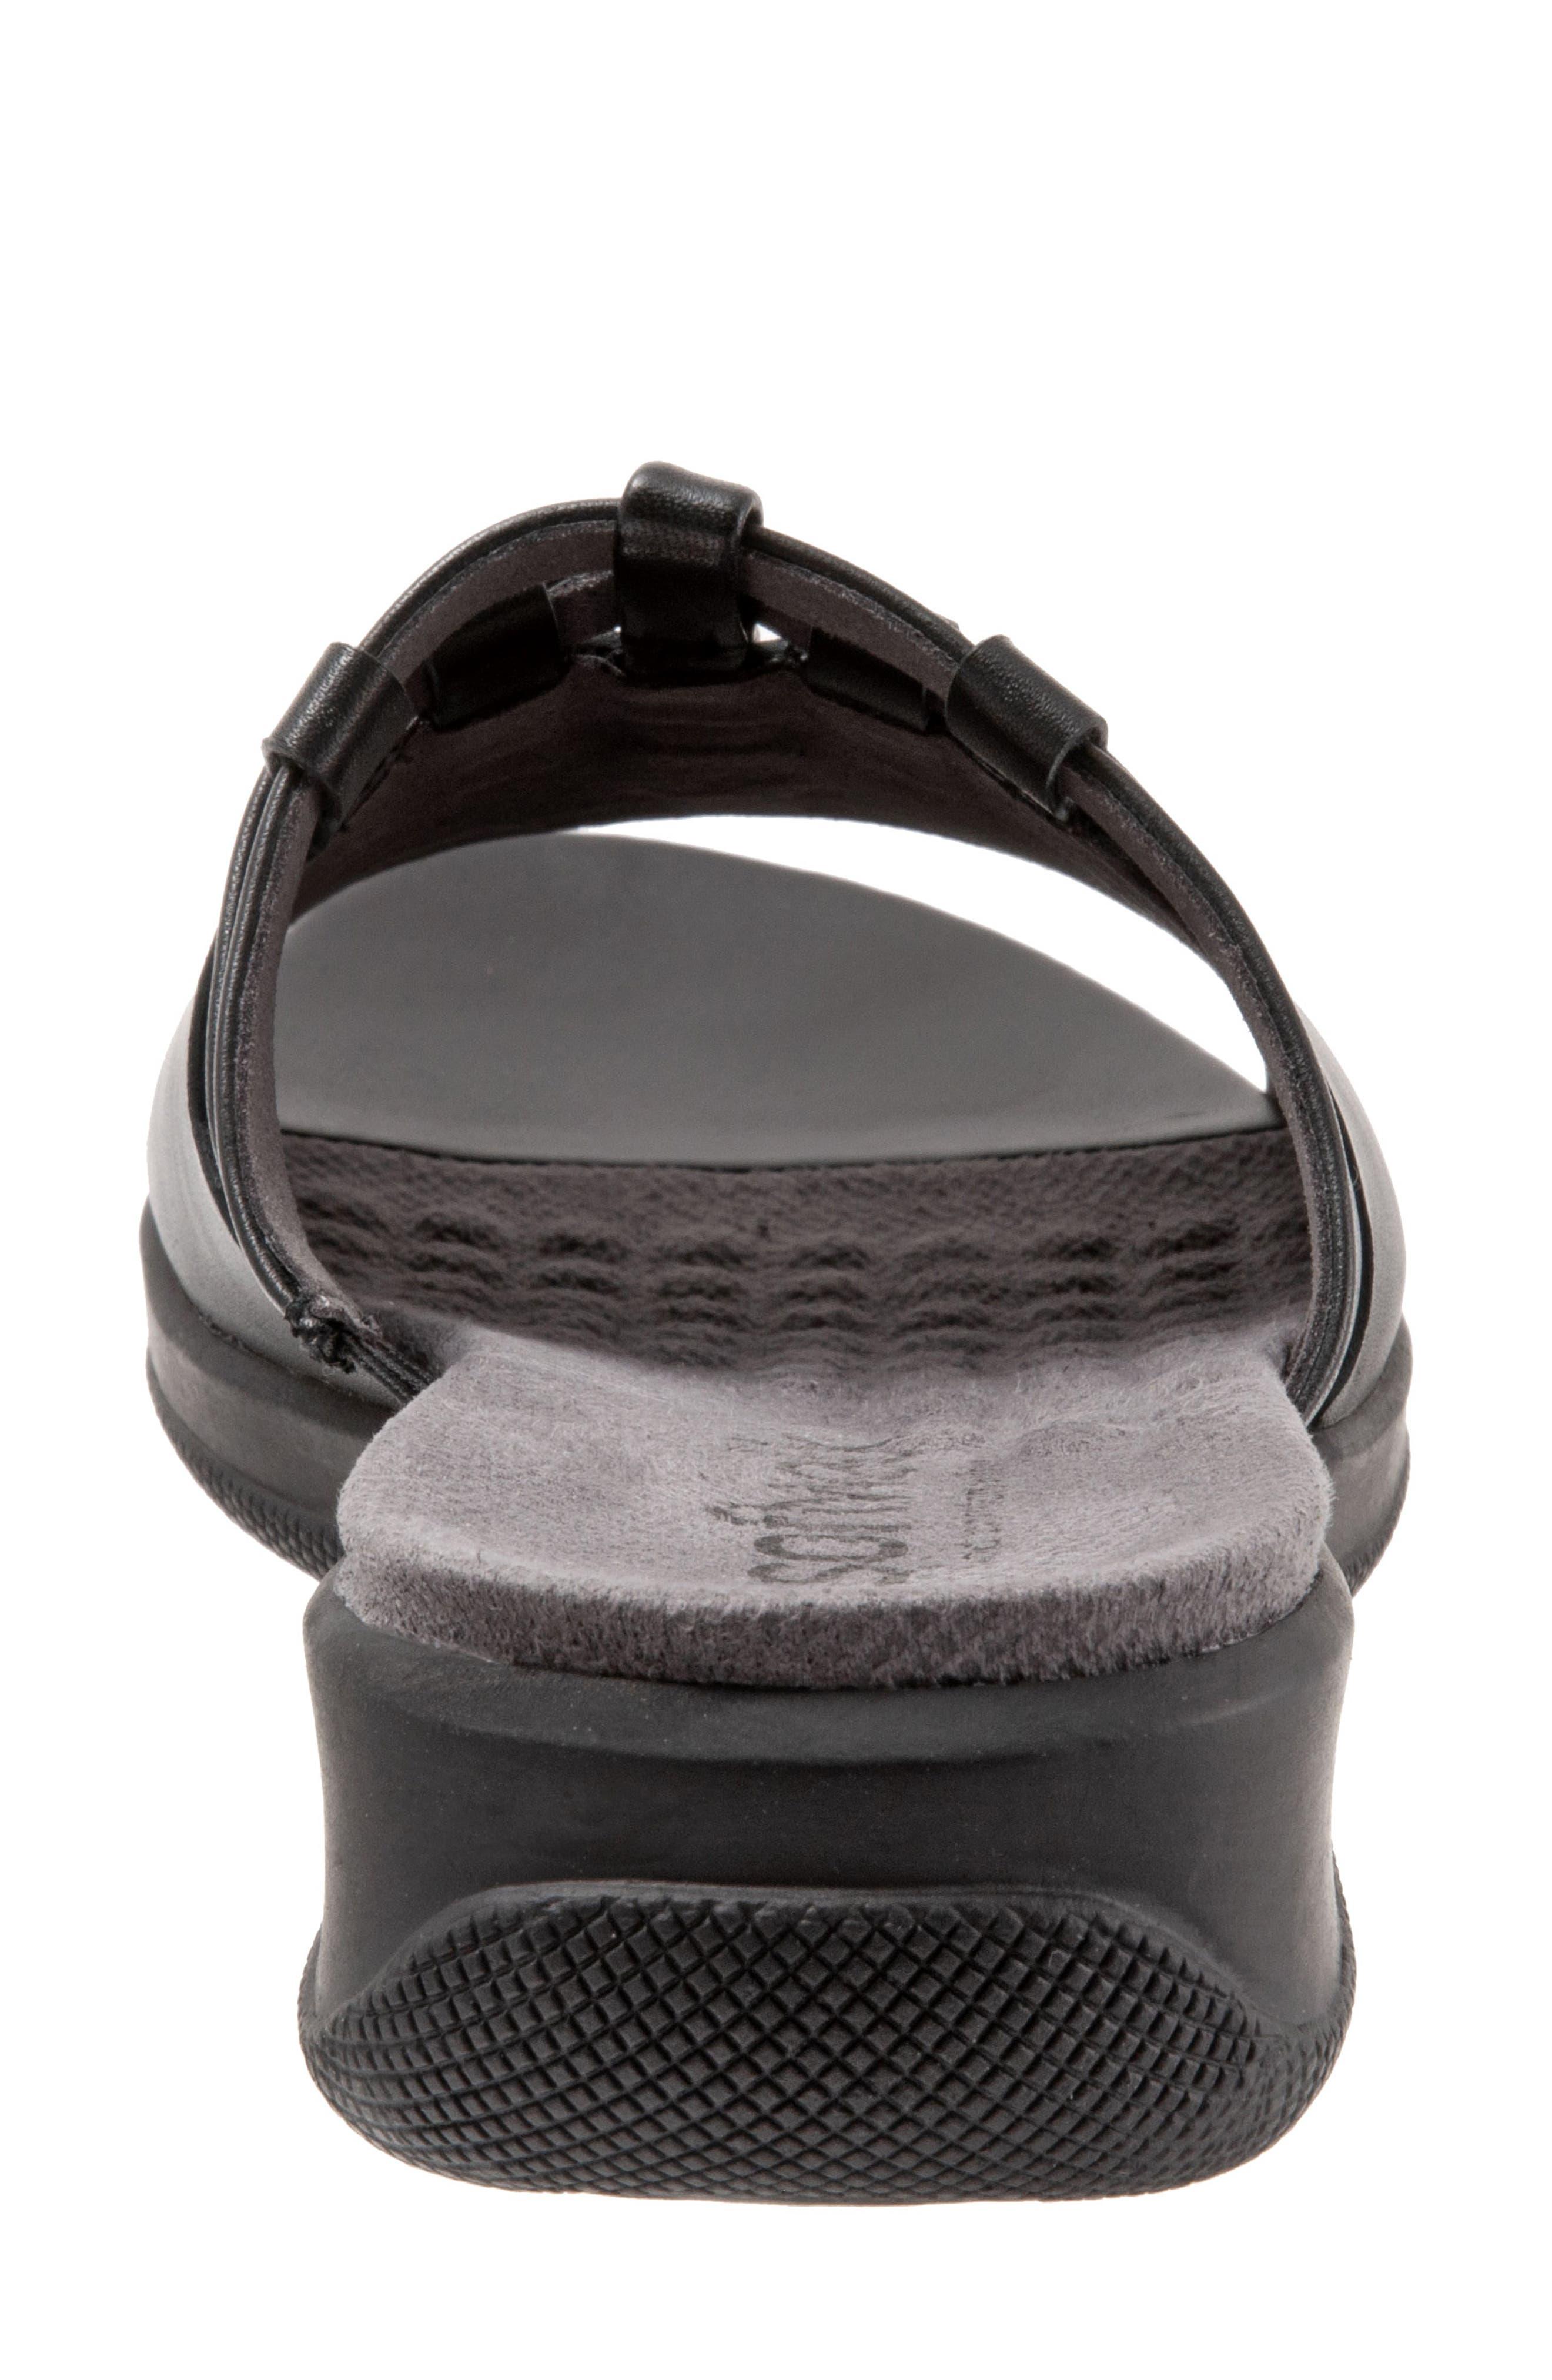 SOFTWALK<SUP>®</SUP>, Tahoma Woven Slide Sandal, Alternate thumbnail 7, color, BLACK LEATHER